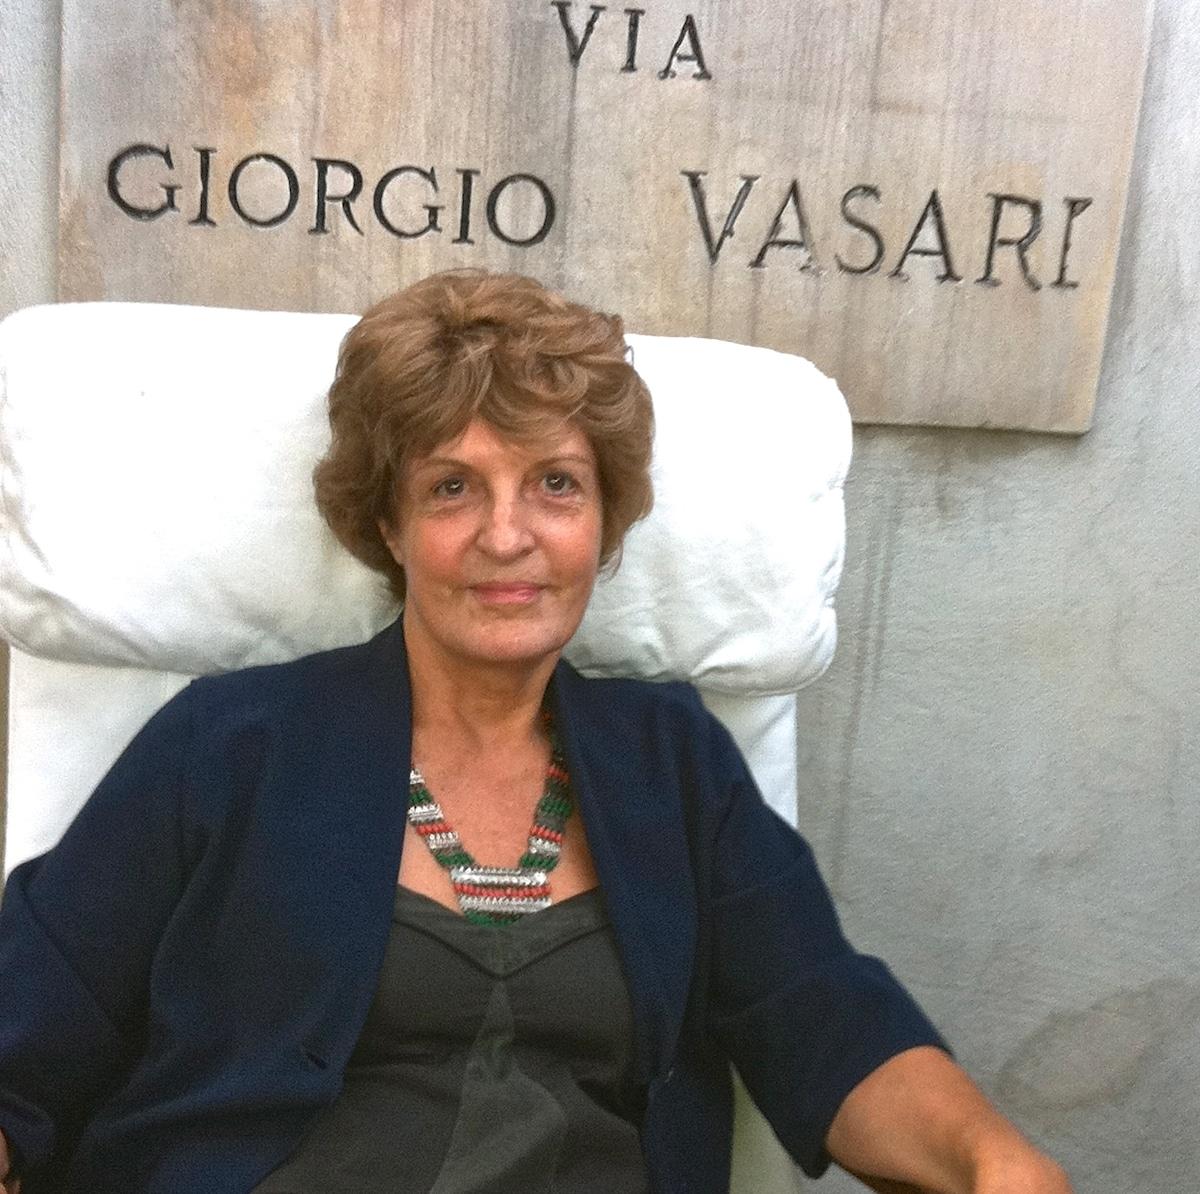 Silvana from Milan